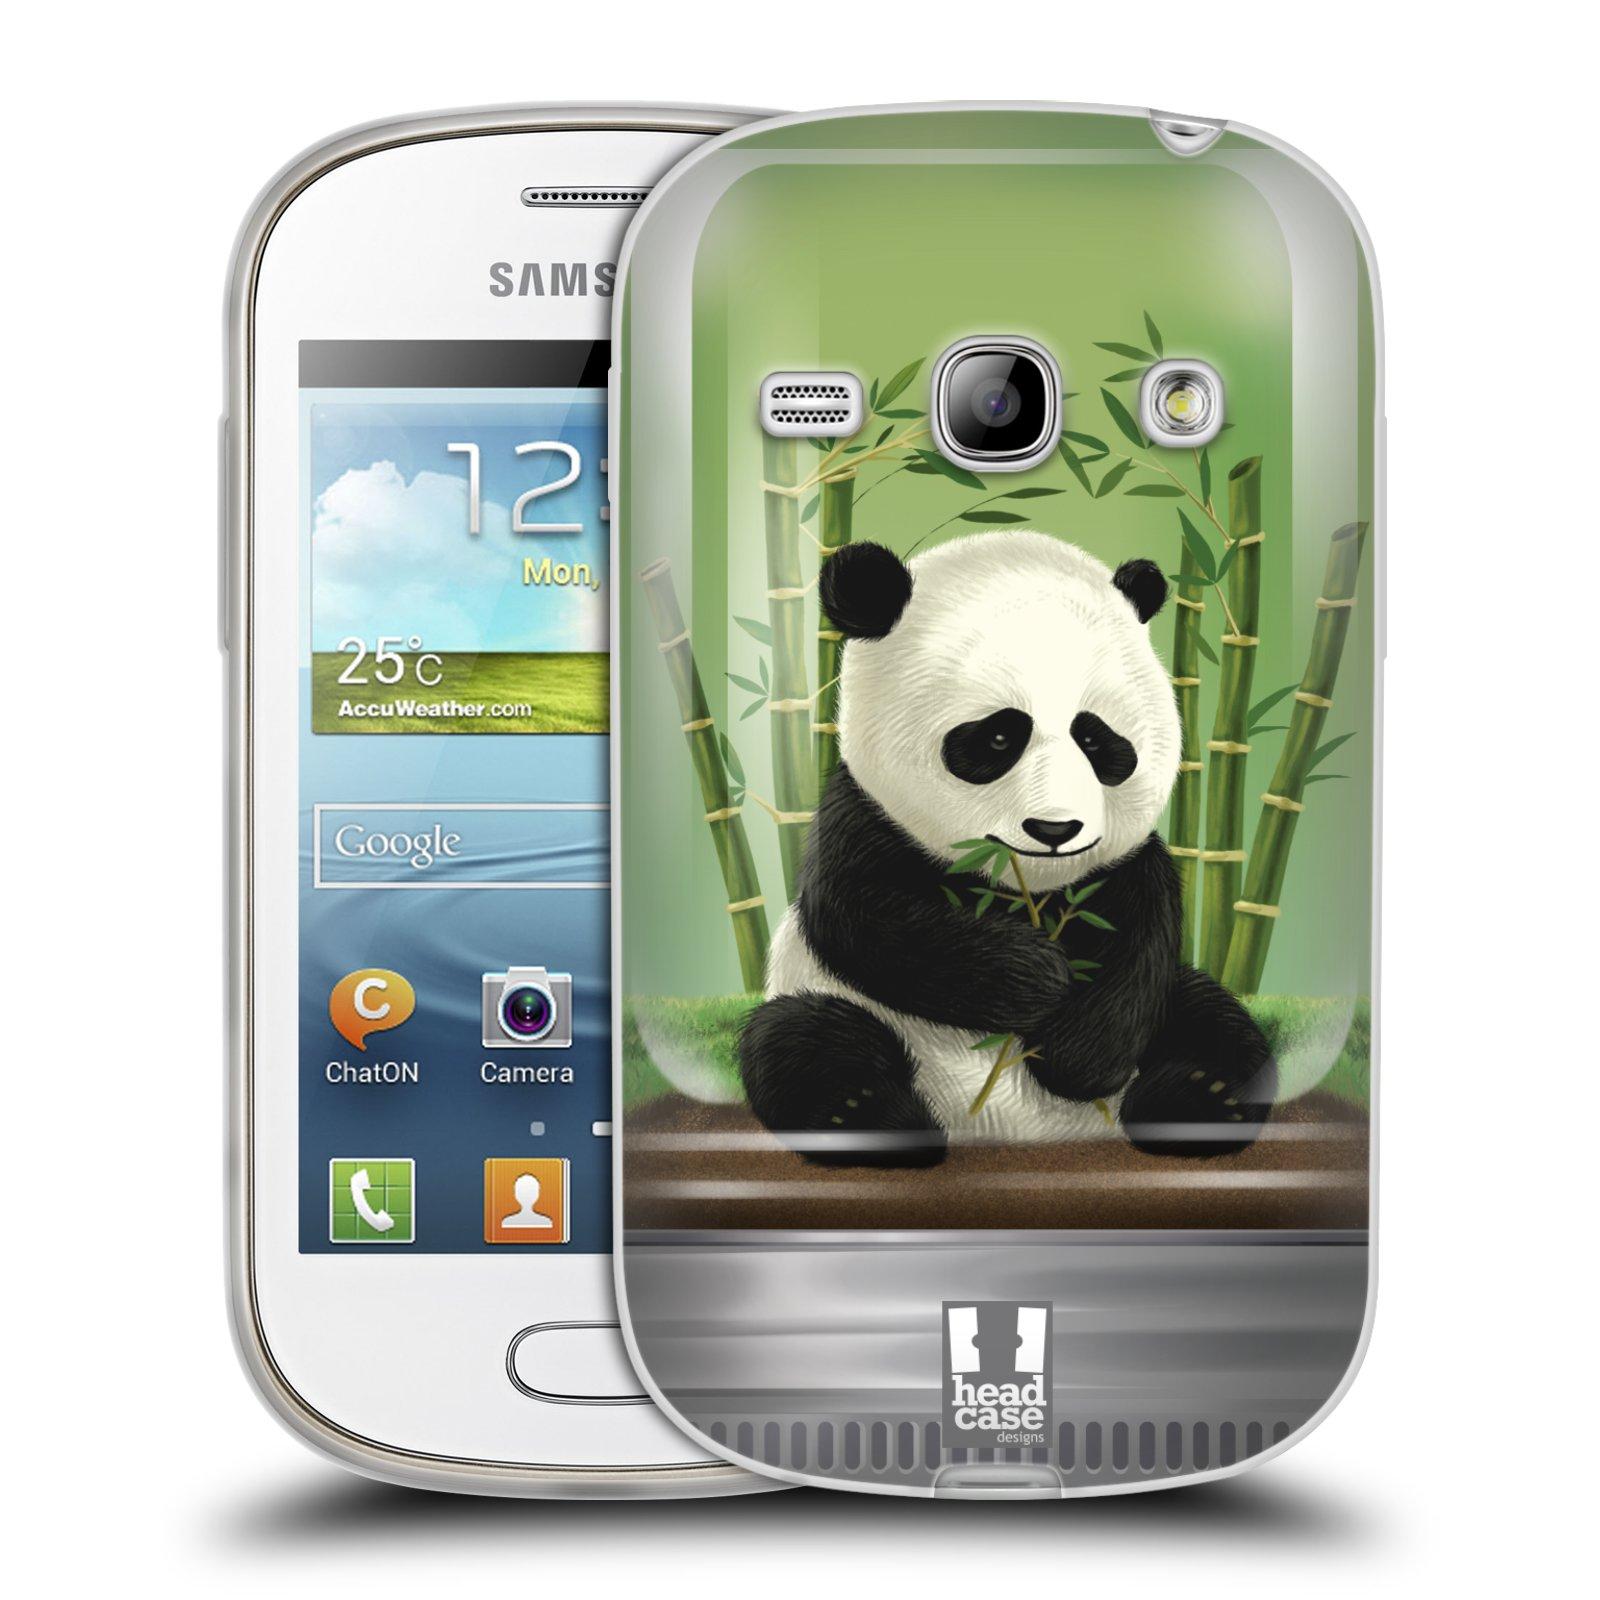 HEAD CASE silikonový obal na mobil Samsung Galaxy FAME vzor Zvířátka v těžítku panda